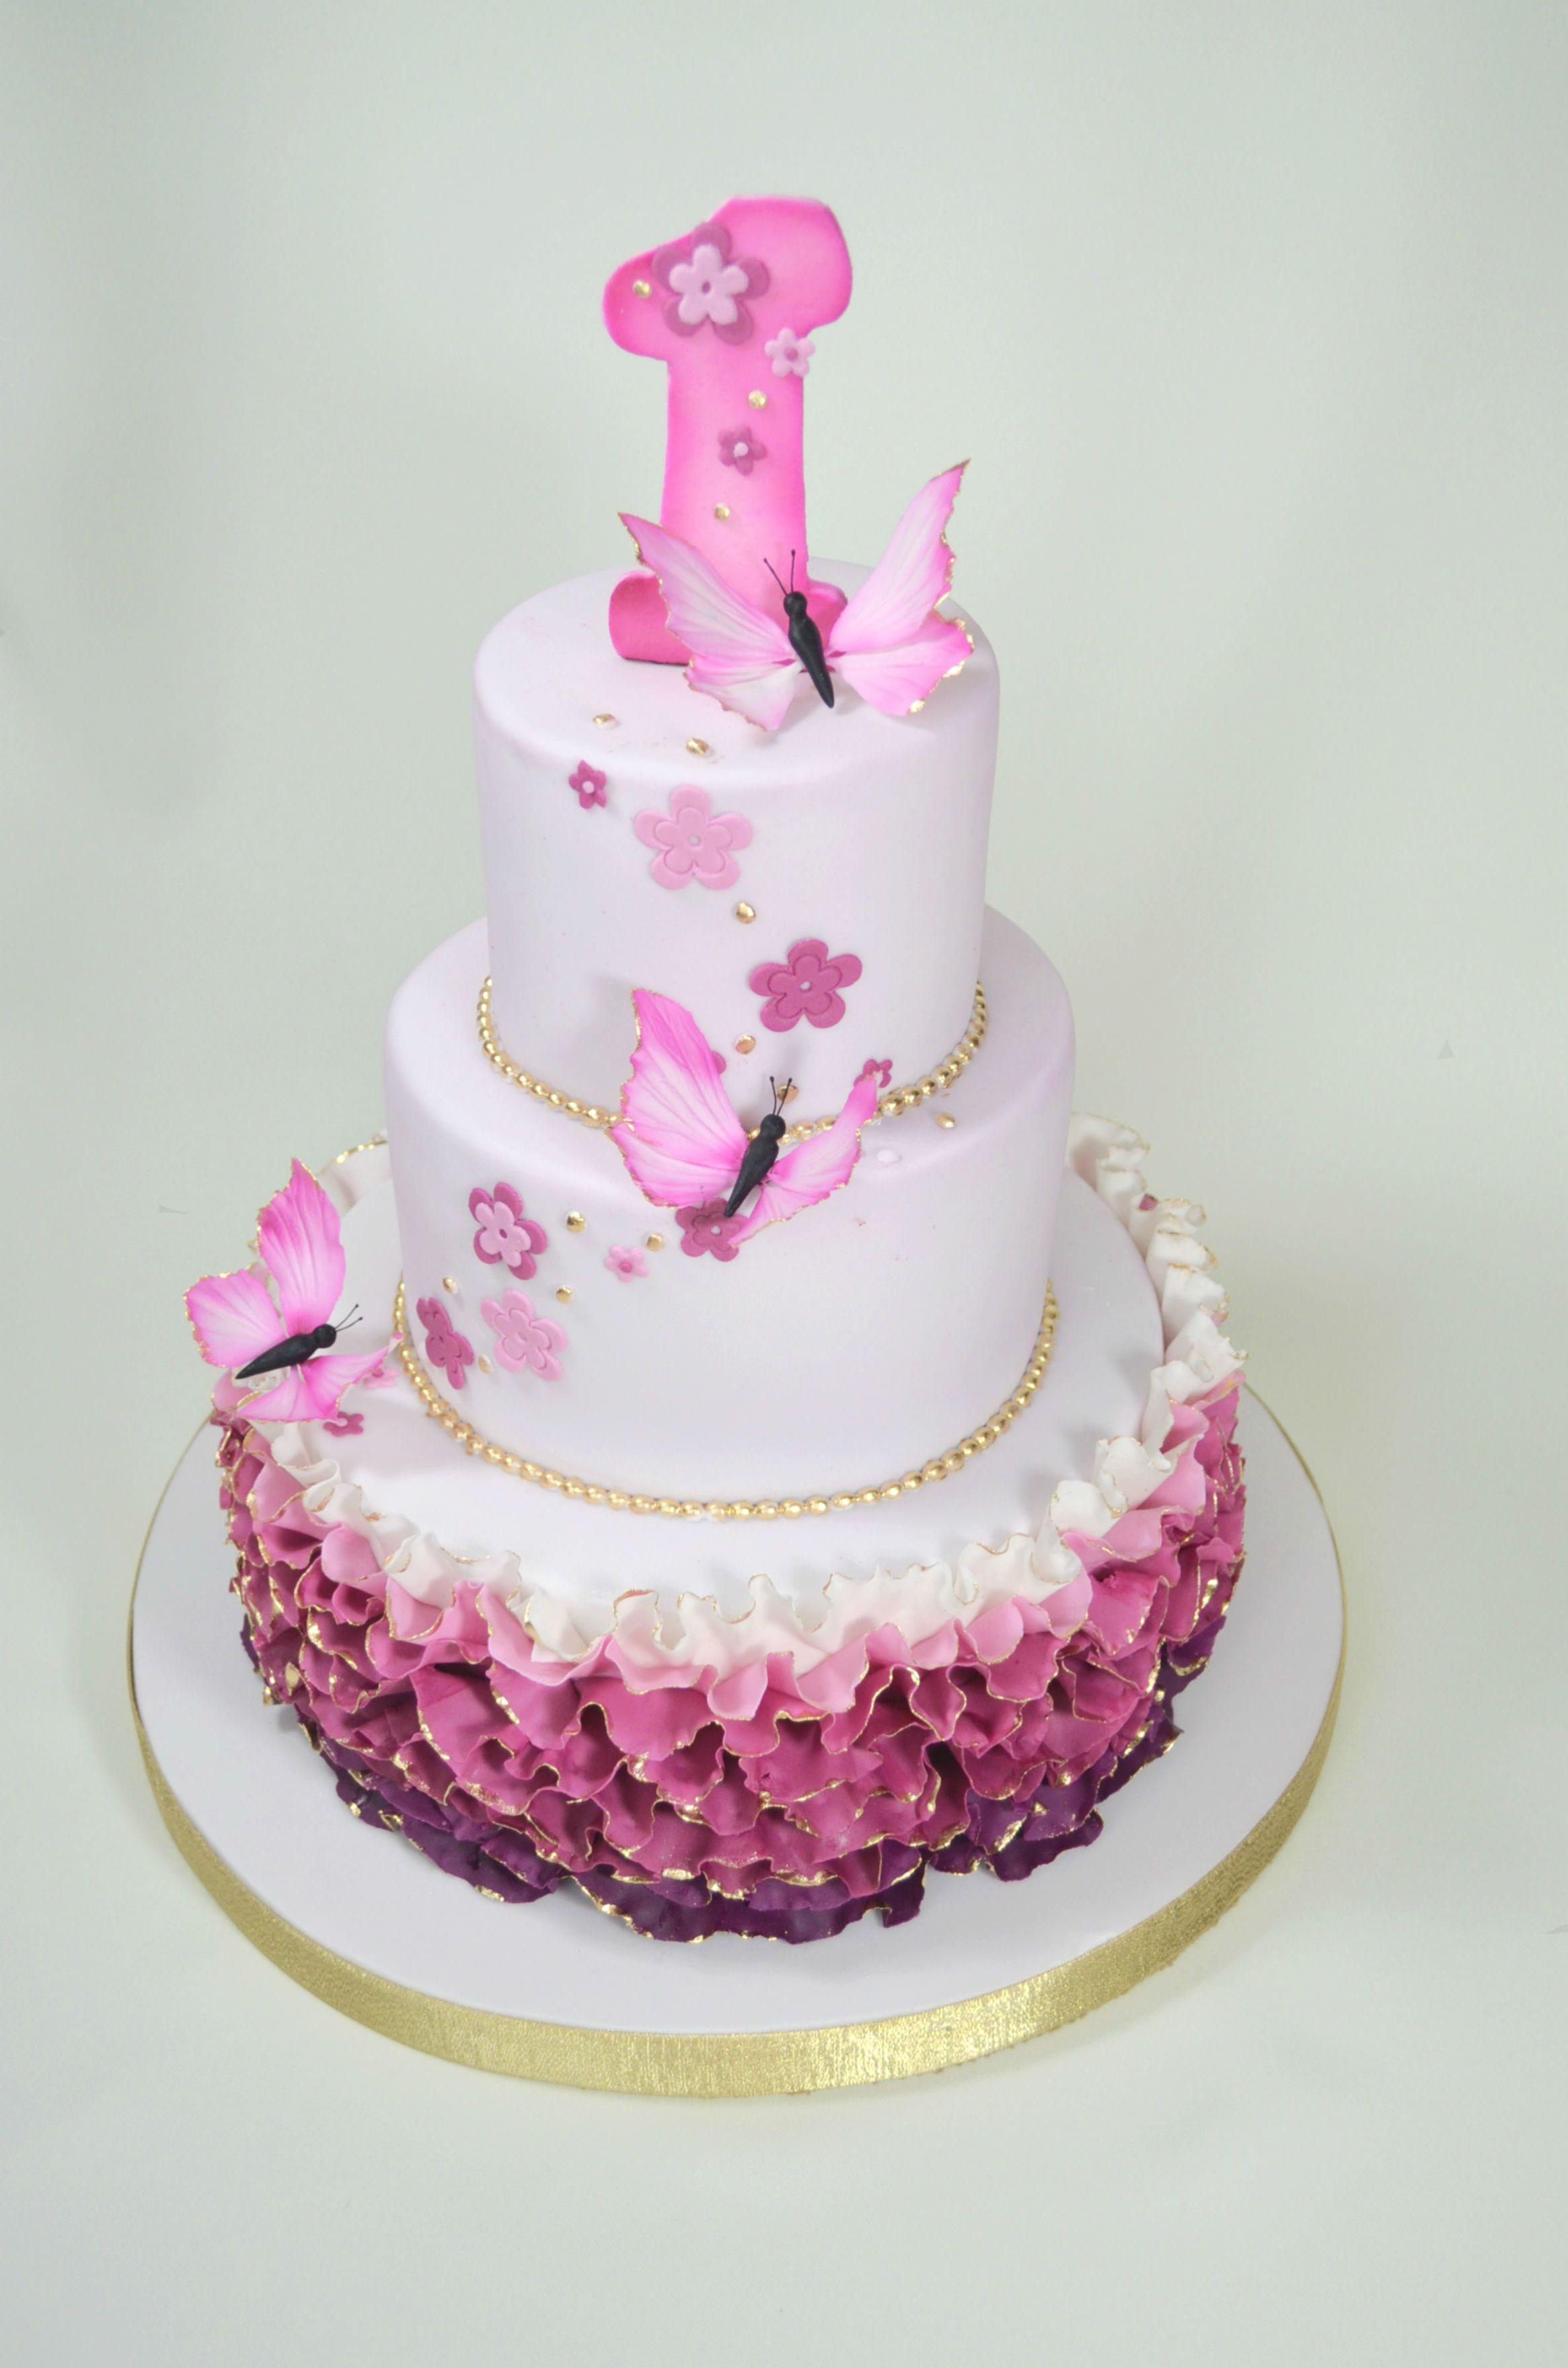 Strange 25Jpg With Images Butterfly Birthday Cakes First Birthday Cakes Funny Birthday Cards Online Inifofree Goldxyz